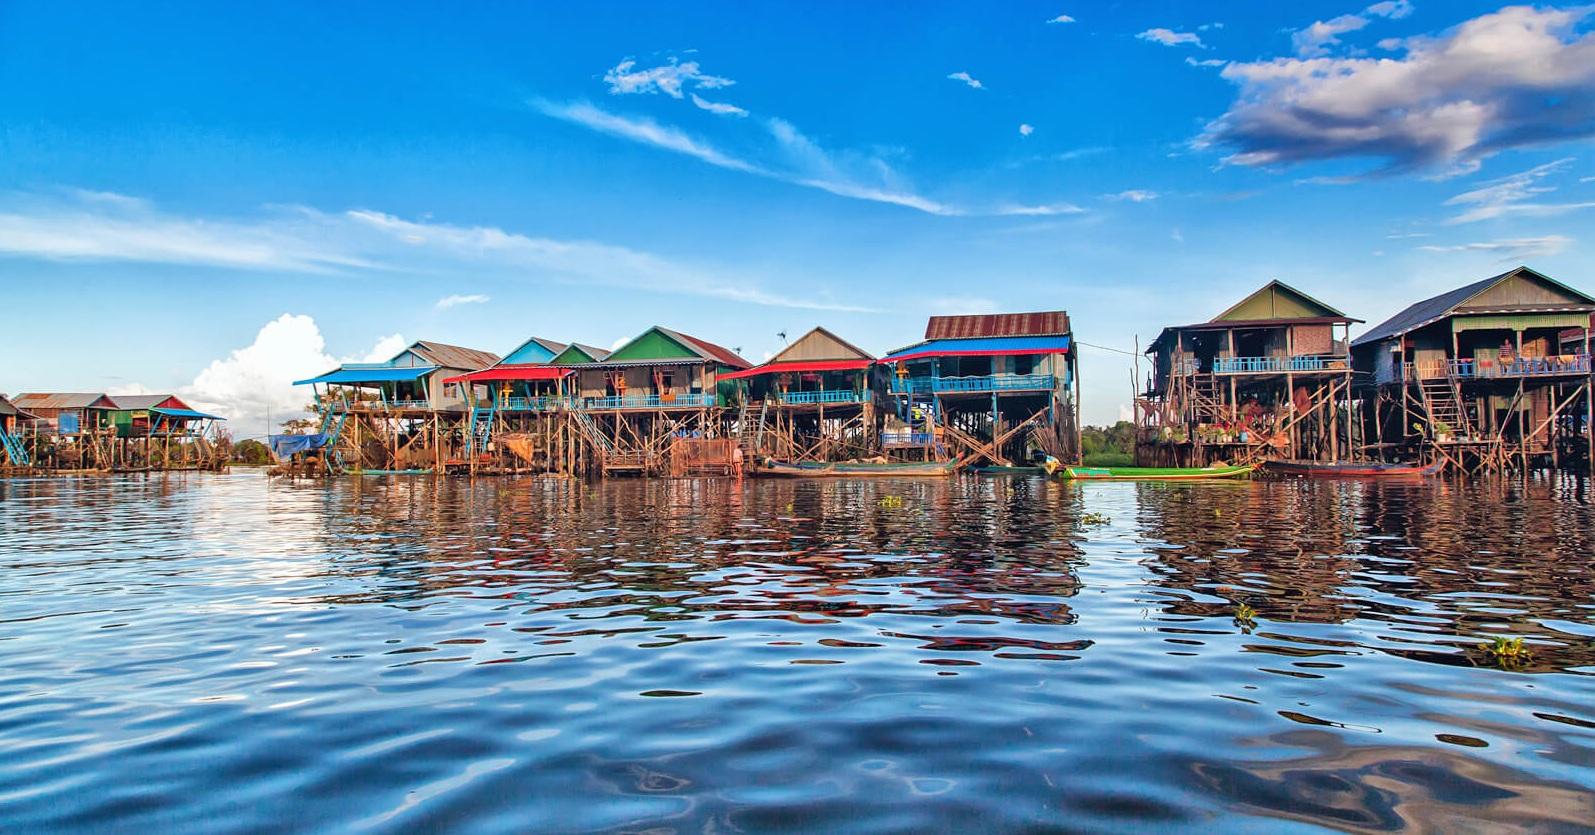 de-cambodge-au-vietnam-en-29-jours-1